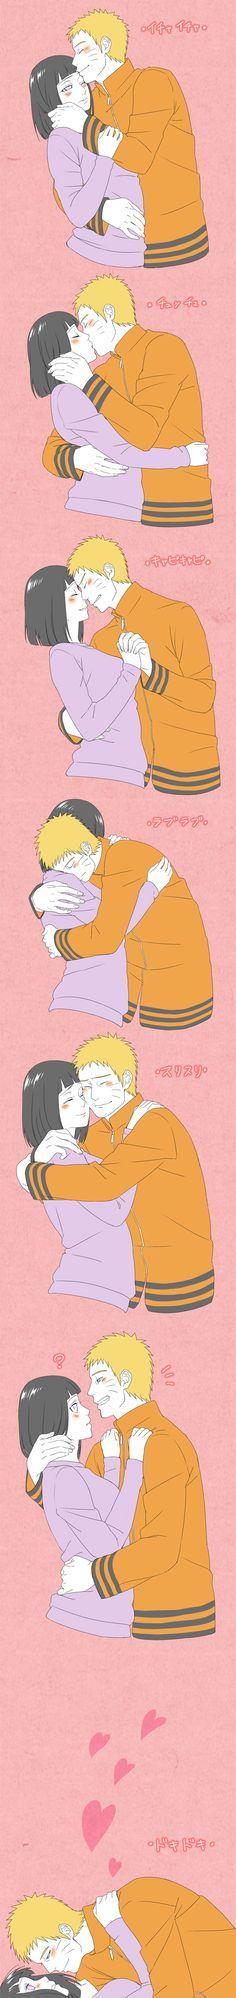 Sakura Jam, NARUTO, Hyuuga Hinata, Uzumaki Naruto, Husband And Wife, Kiss On The Lips